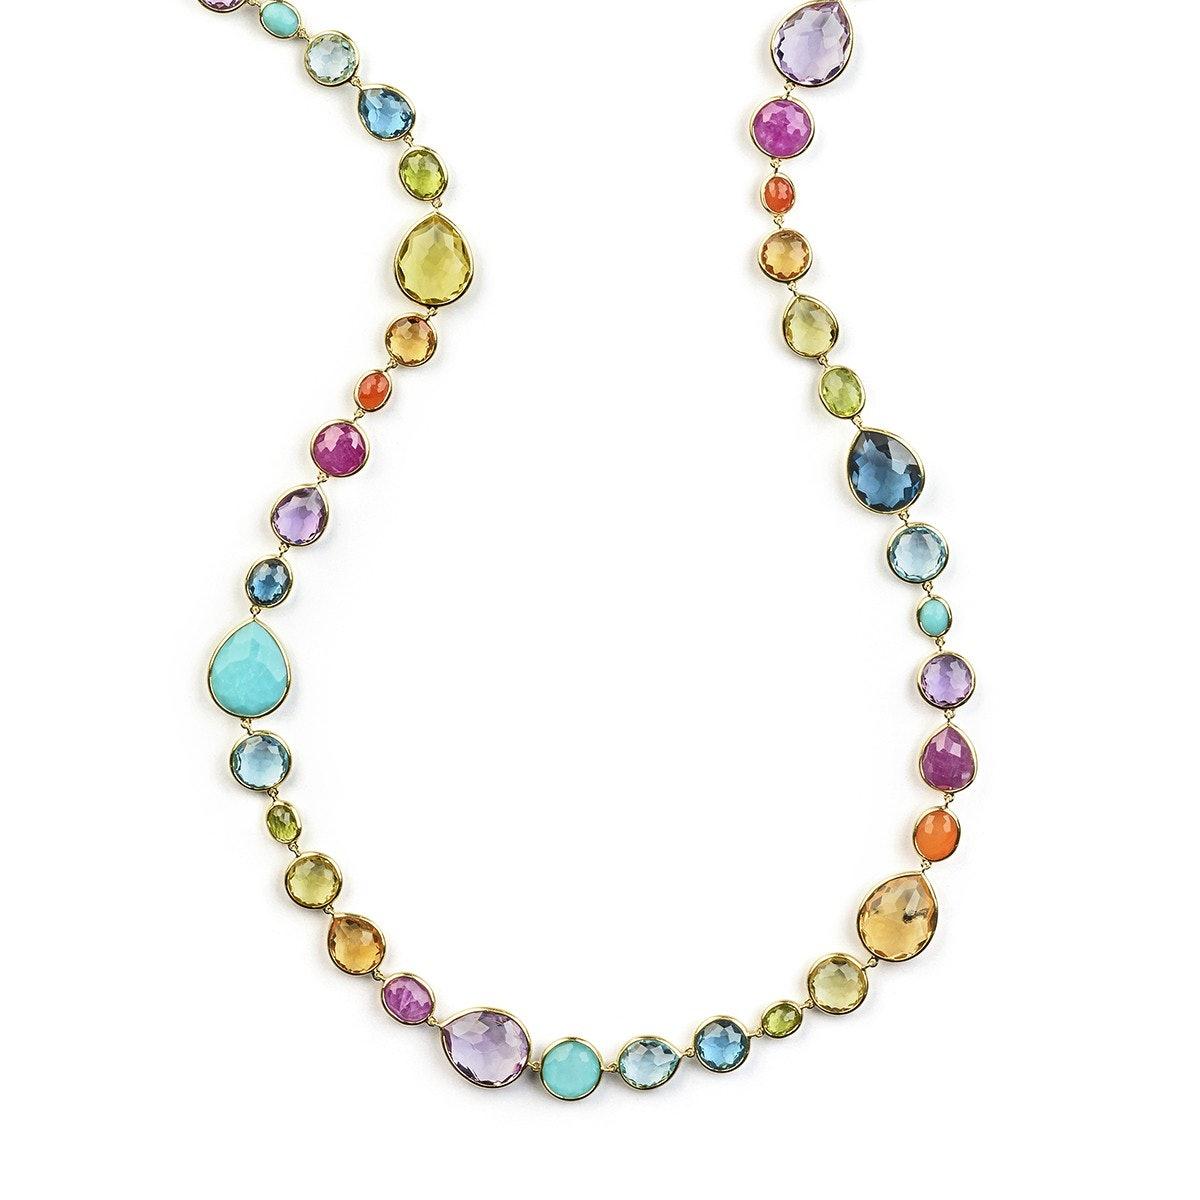 Ippolita 18K gold necklace, $22,500, ippolita.com